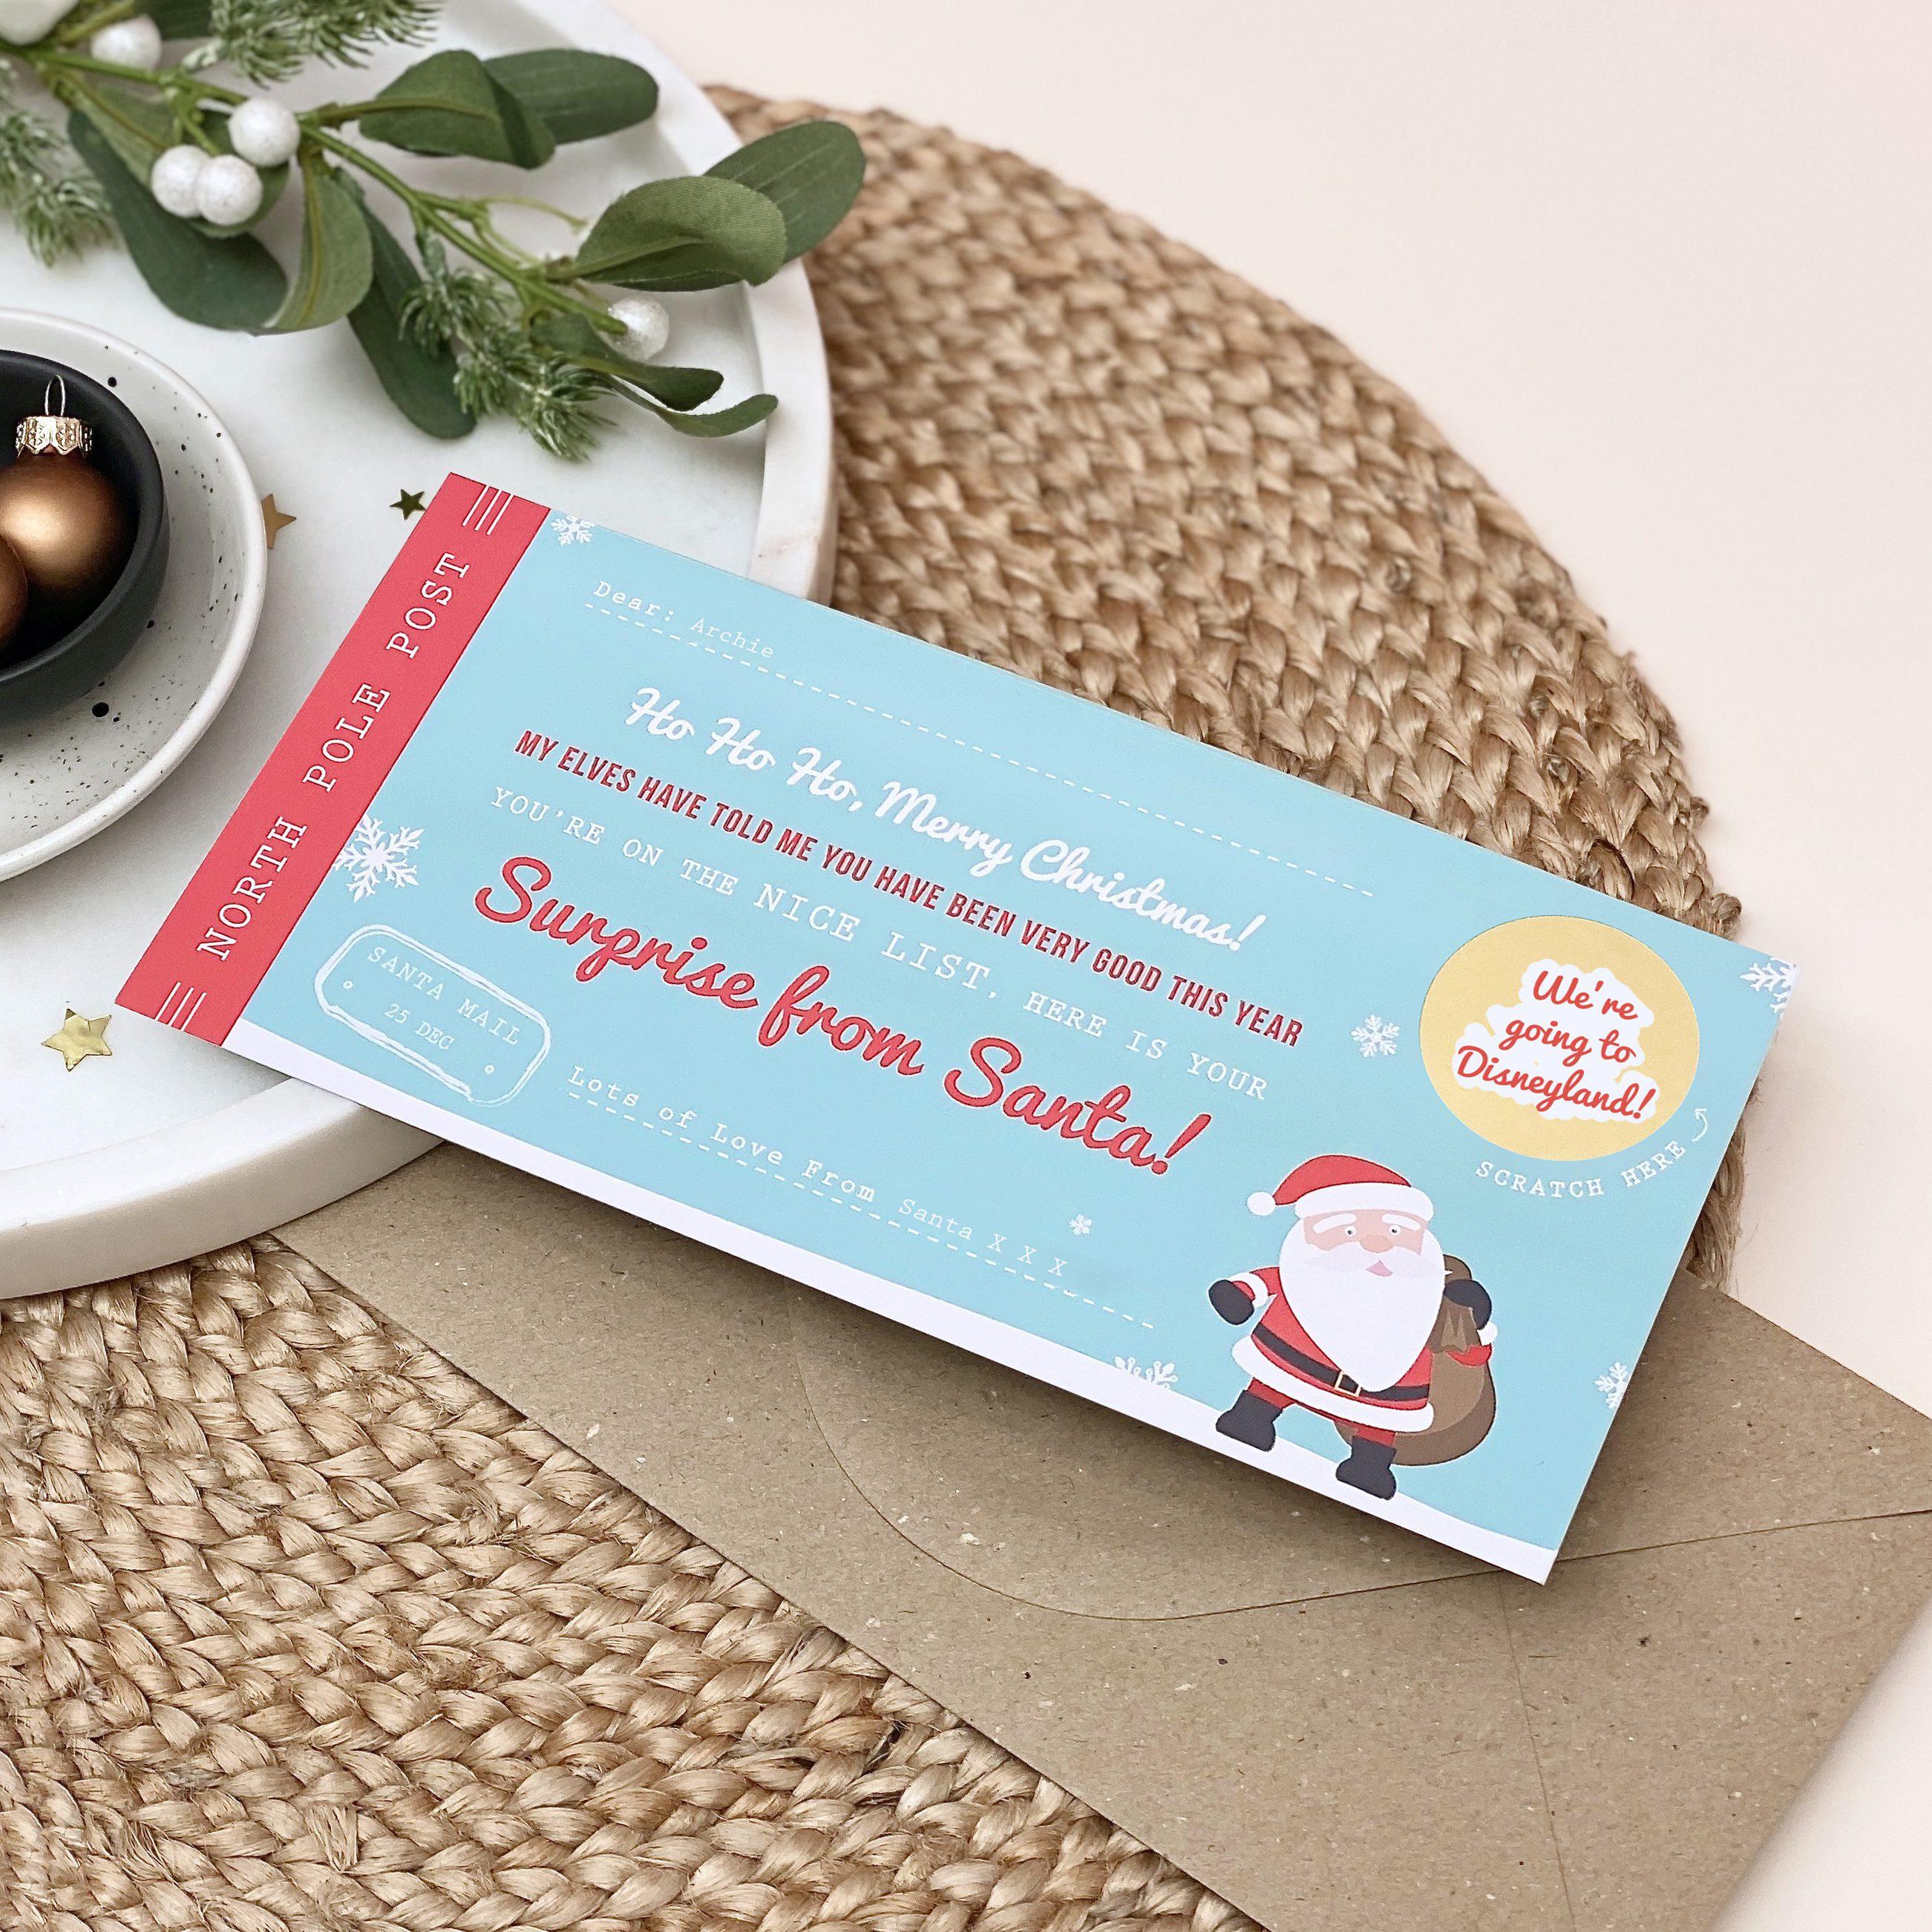 Santa's Surprise Scratch Off Ticket - Designed by Rodo Creative